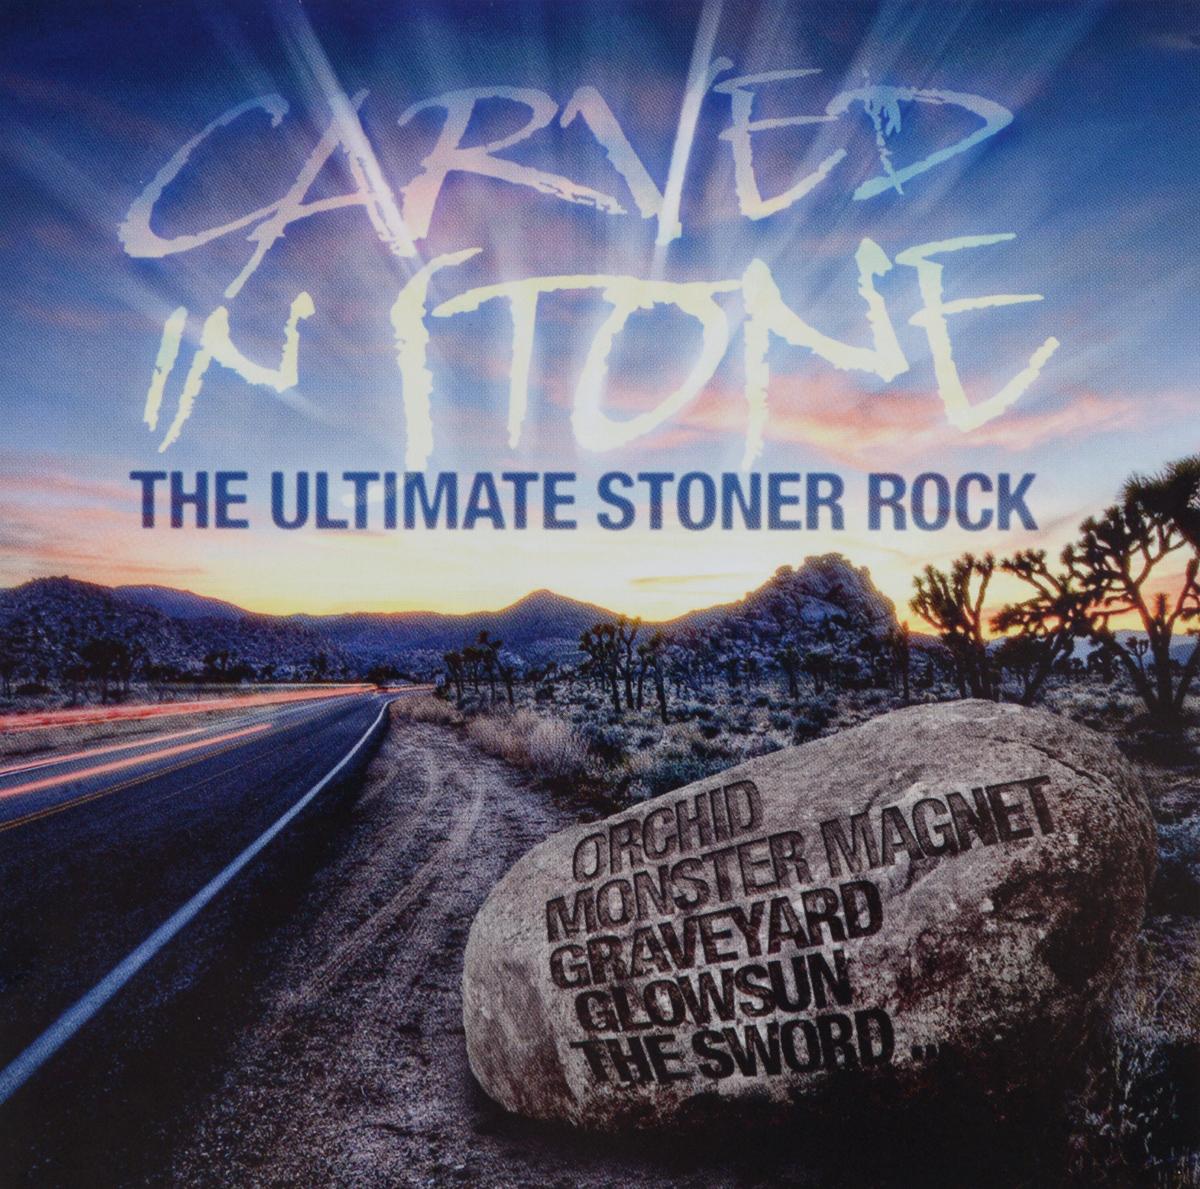 Carved In Stone. The Ultimate Stoner Rock carved beaded bracelet